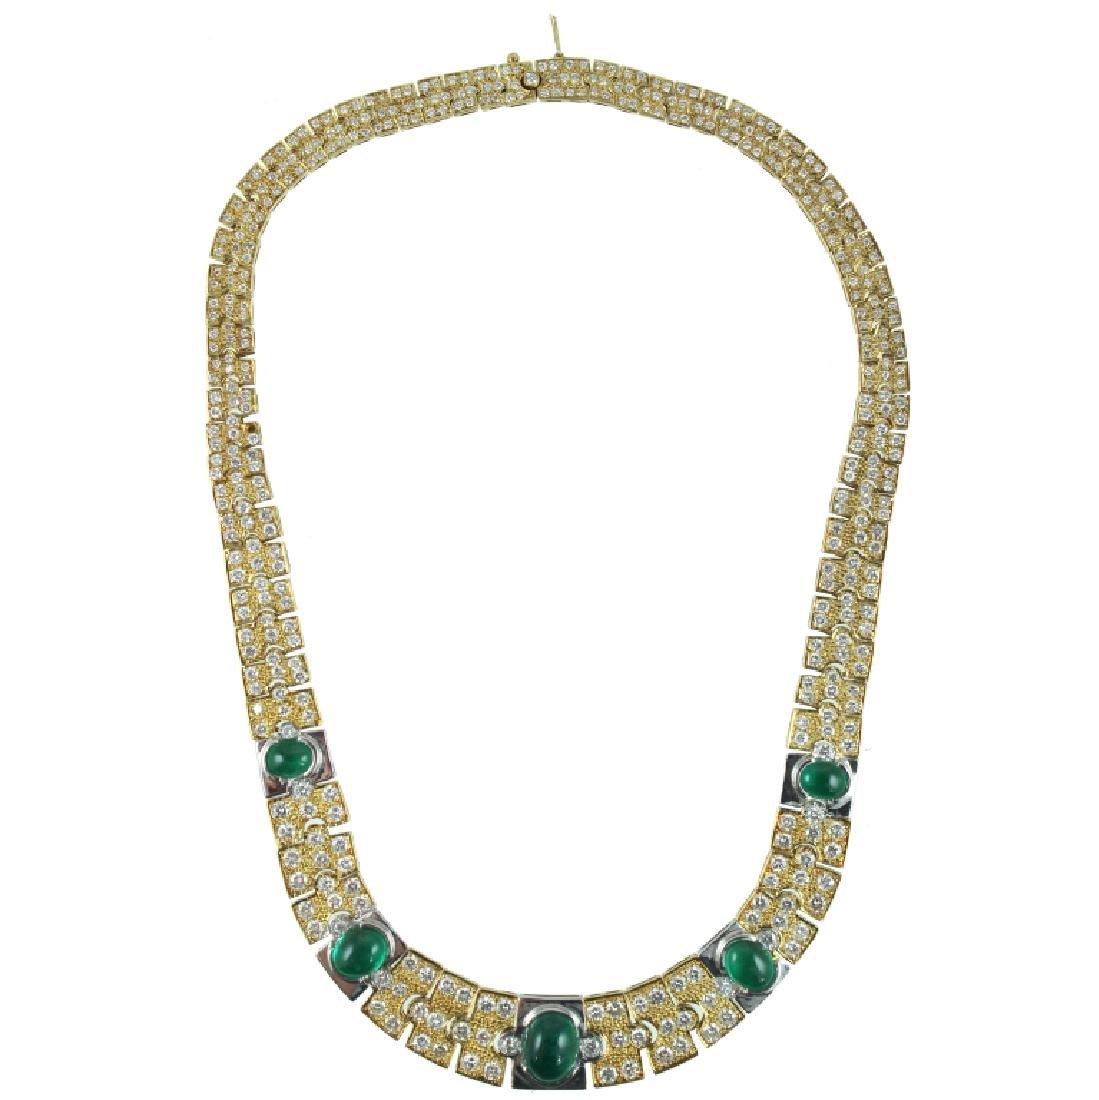 18K Yellow Gold, Diamond & Emerald Necklace